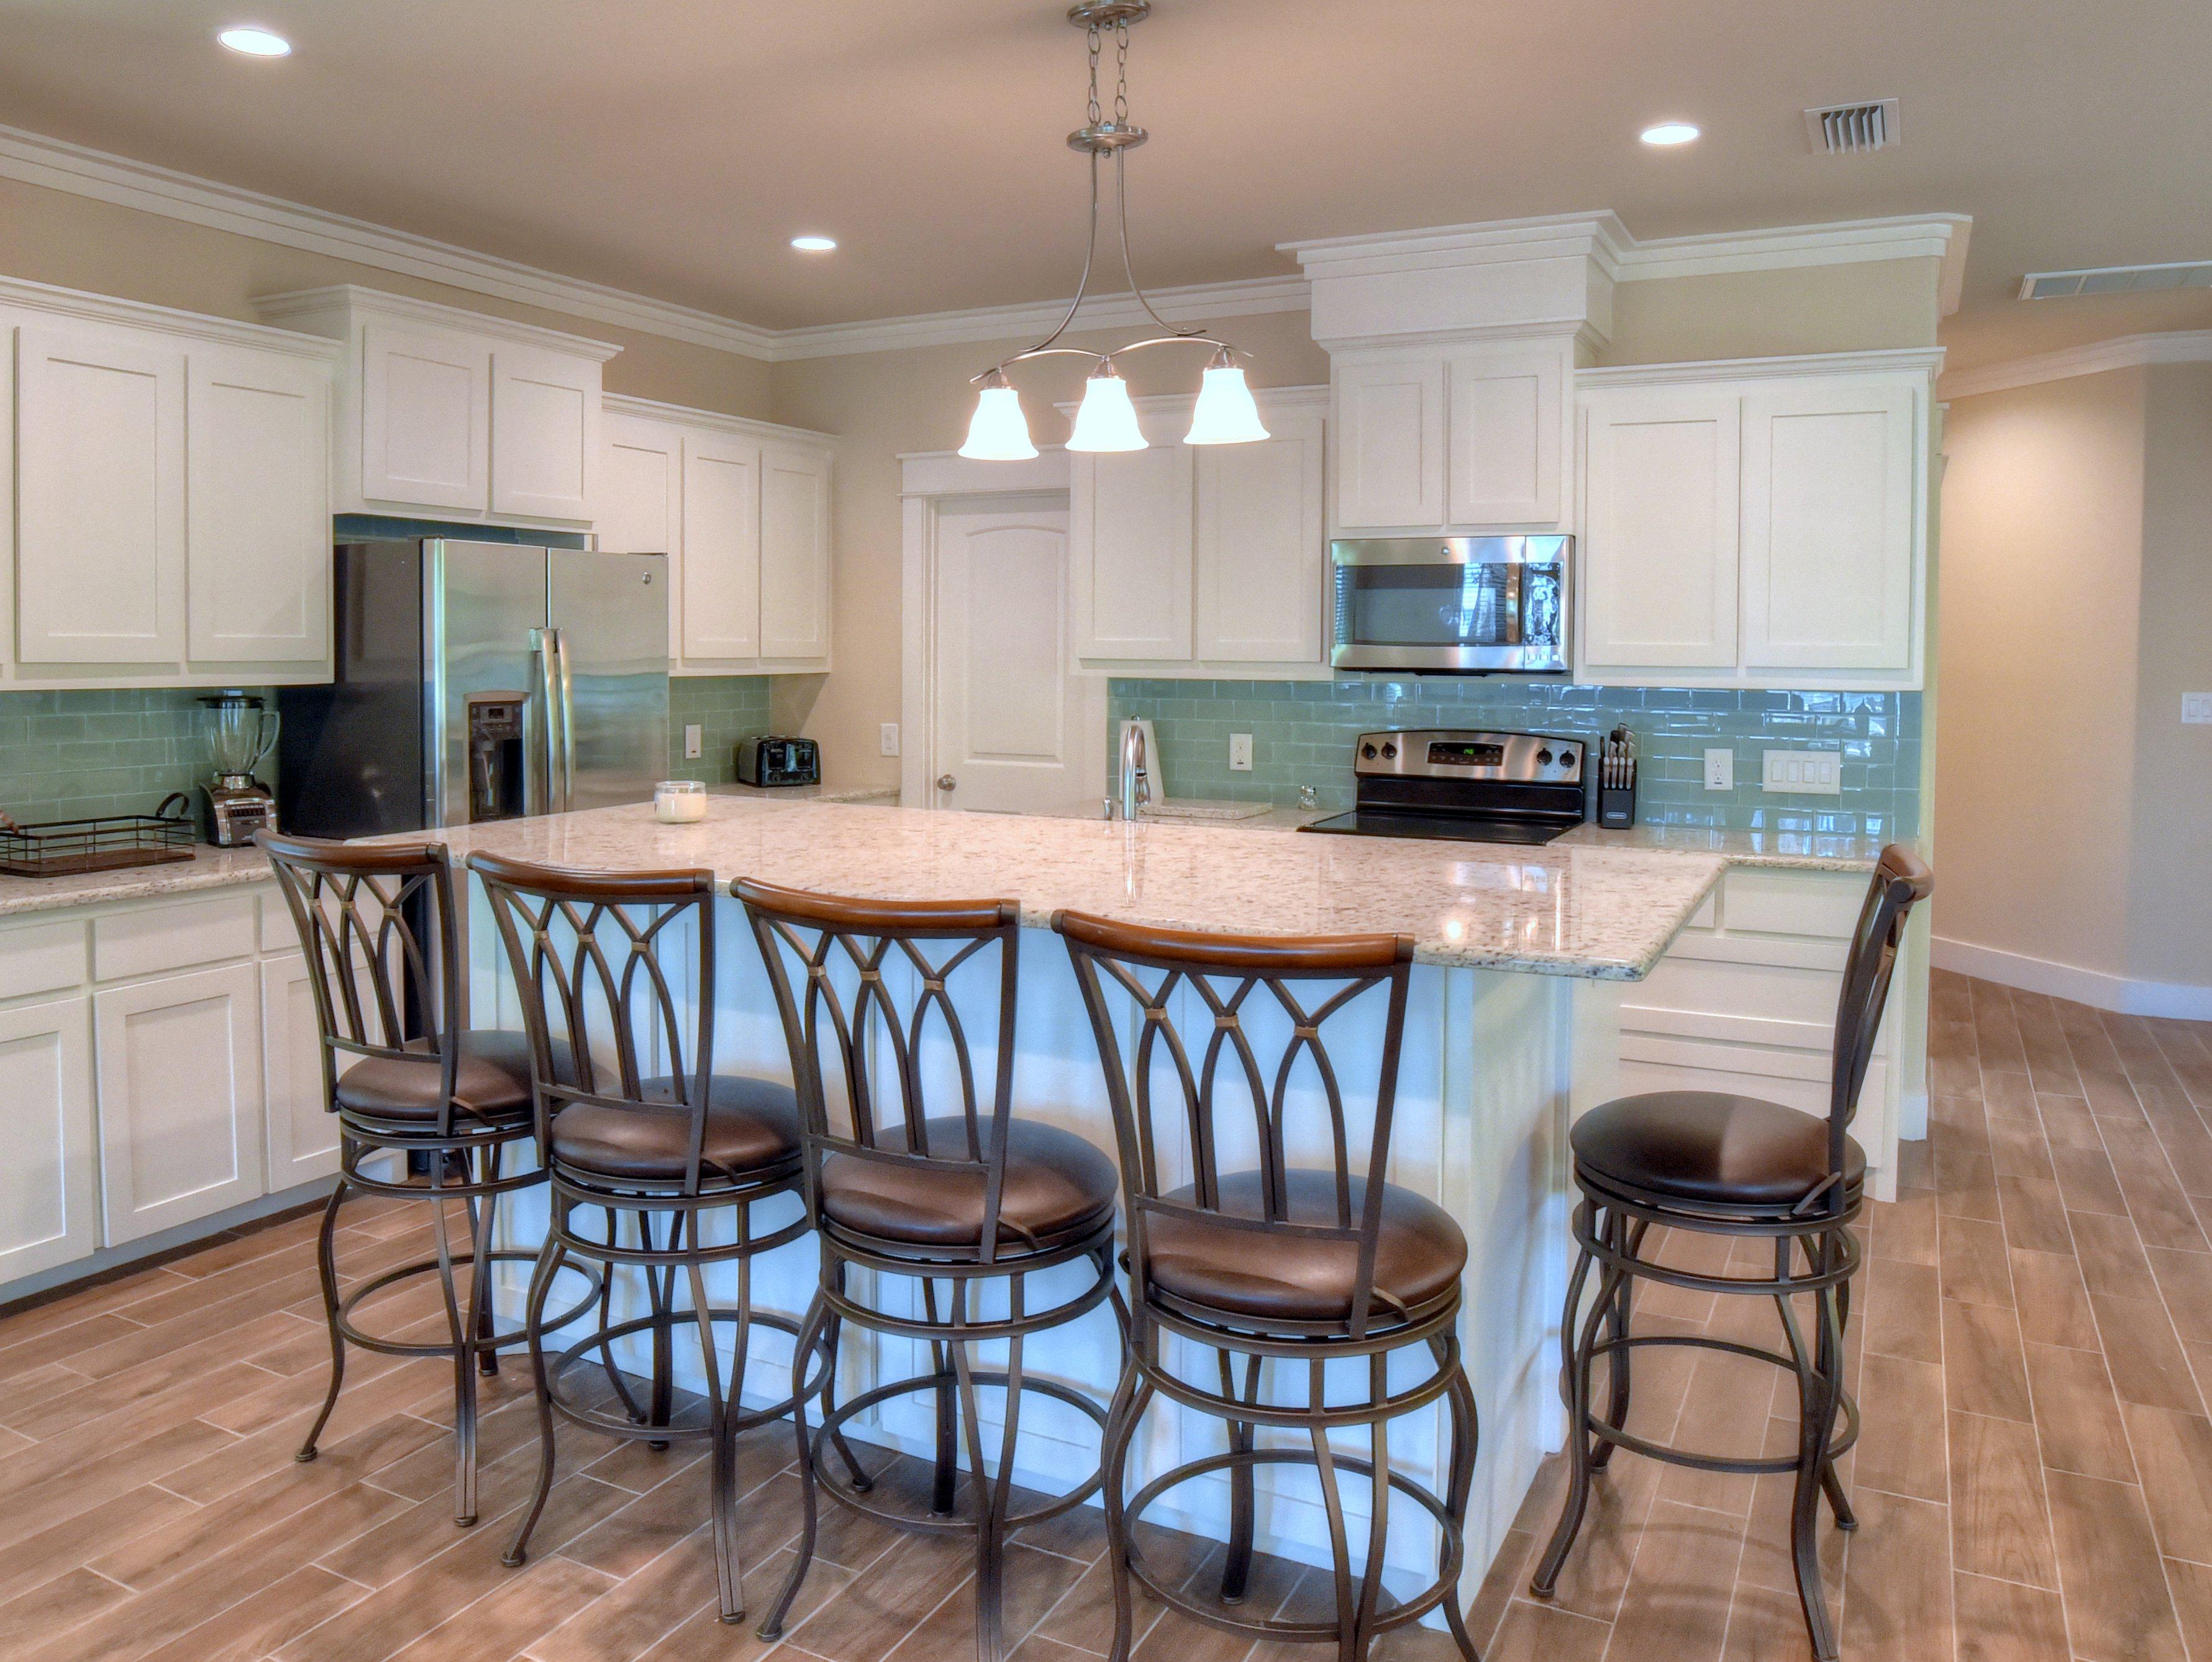 93 Beacon Point Condo rental in Sandestin Rentals ~ Cottages and Villas  in Destin Florida - #9